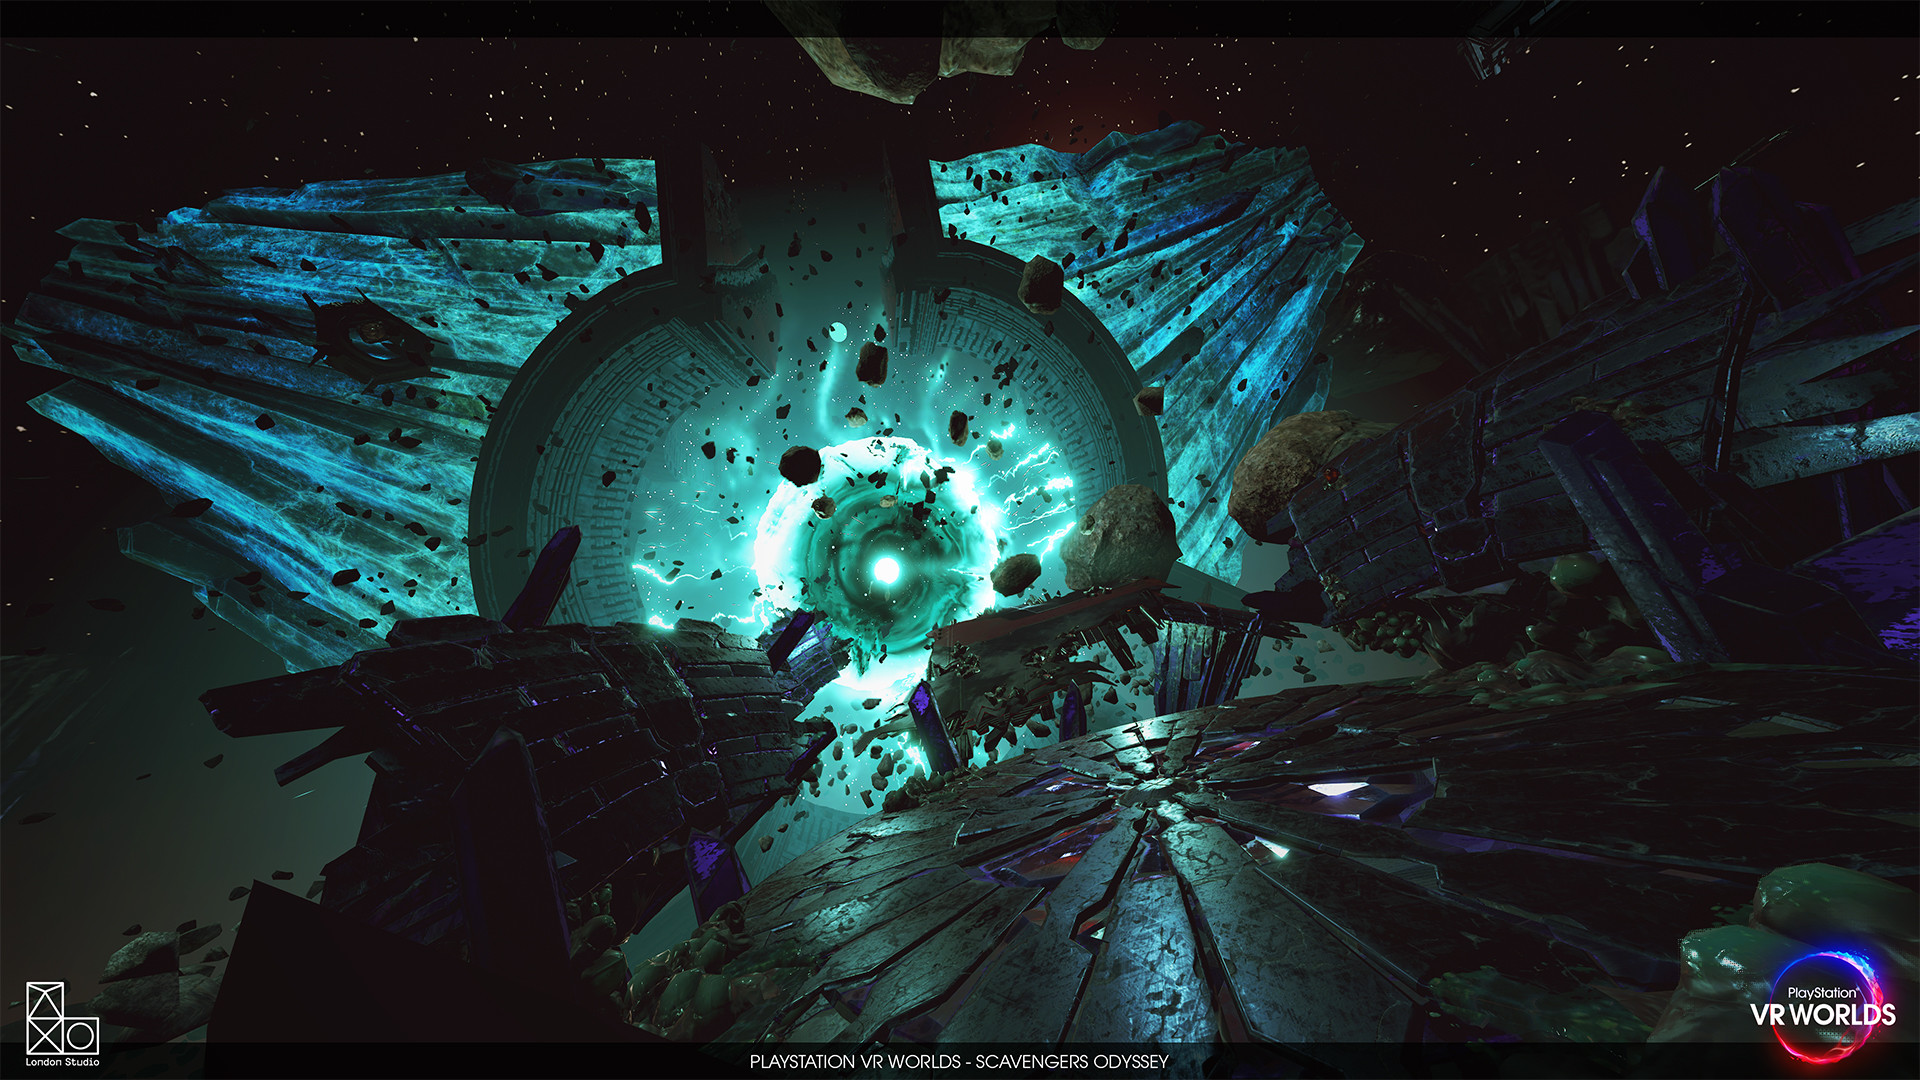 David nicholls psvr vfx screenshot 07